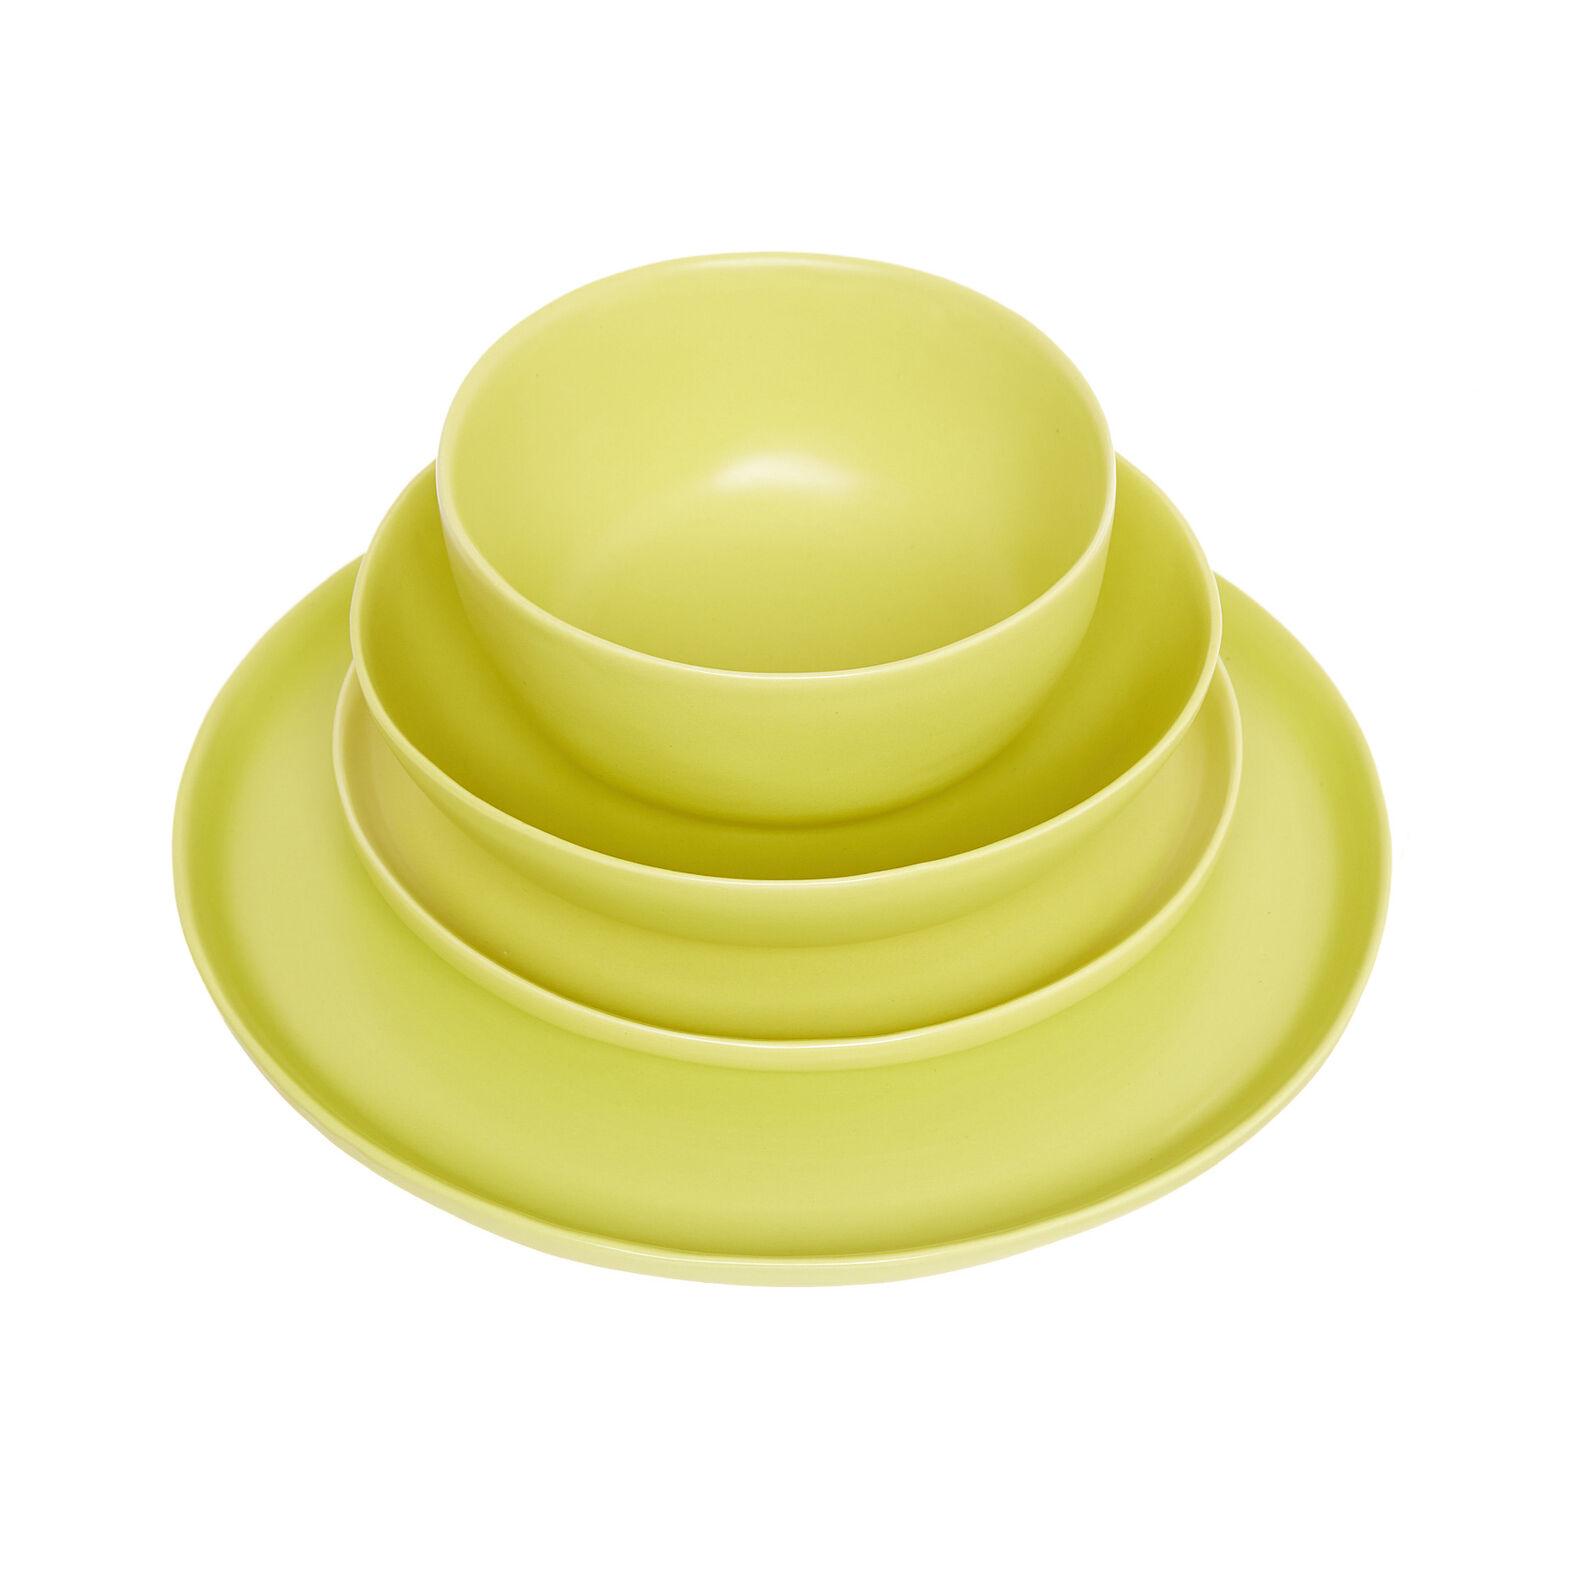 Small bowl in hard opaque ceramic